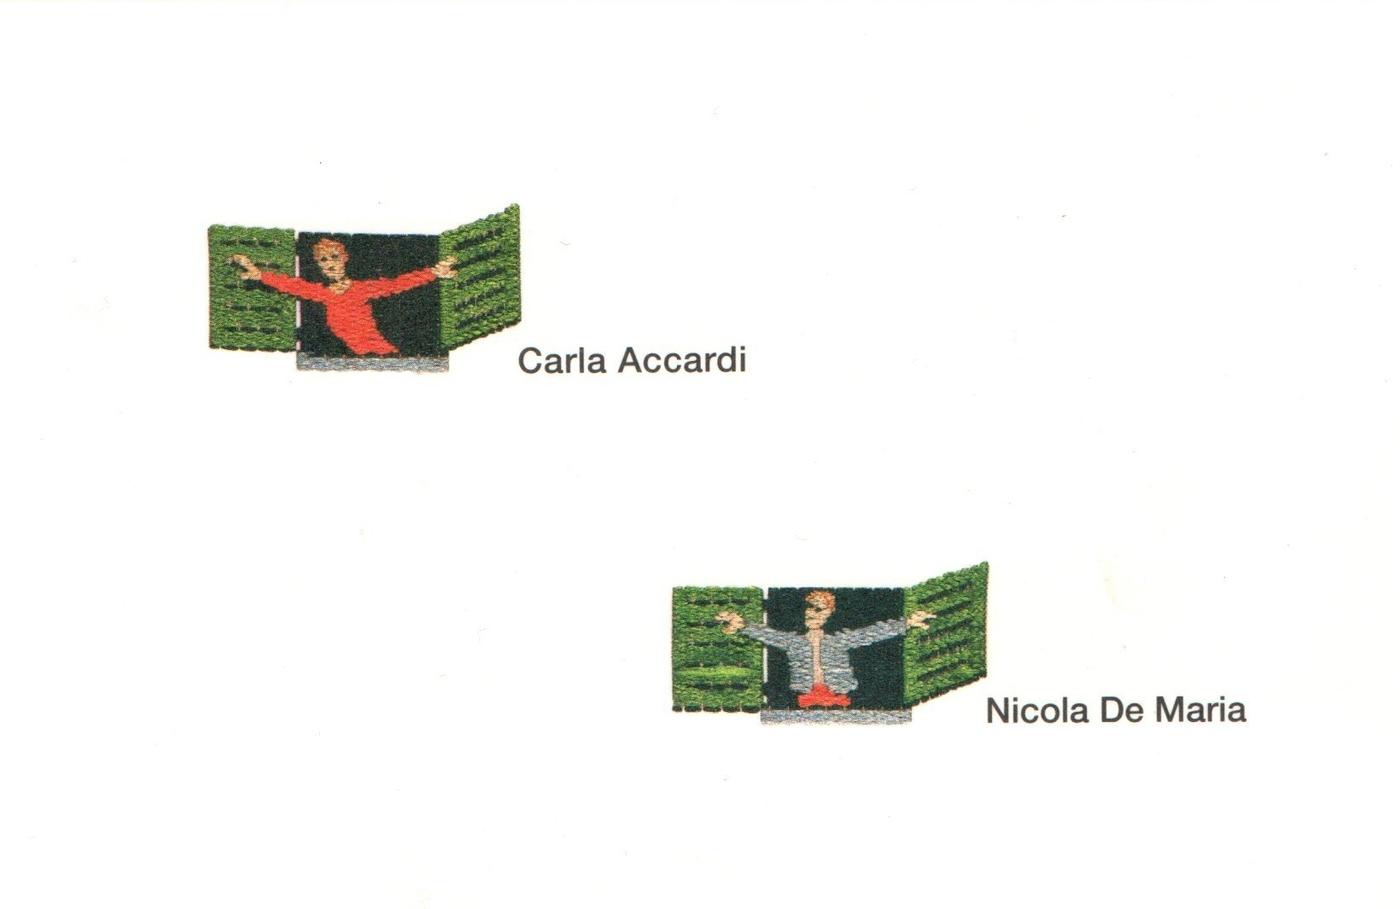 Carla Accardi, Nicola De Maria, Finestre